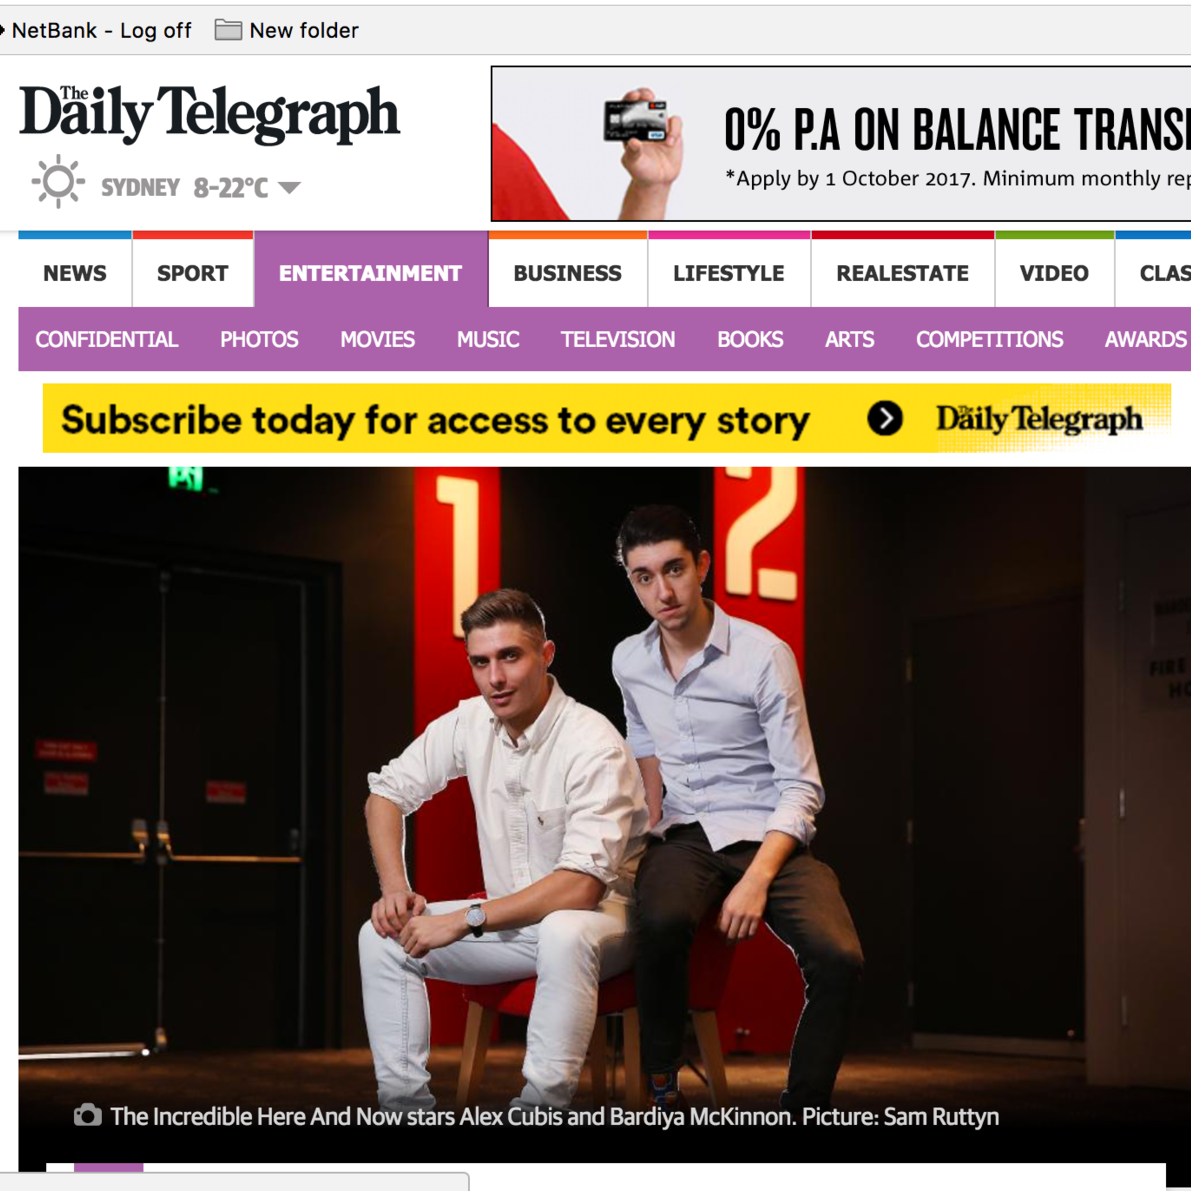 Daily Telegraph: Alex Cubis & Bardiya McKinnon